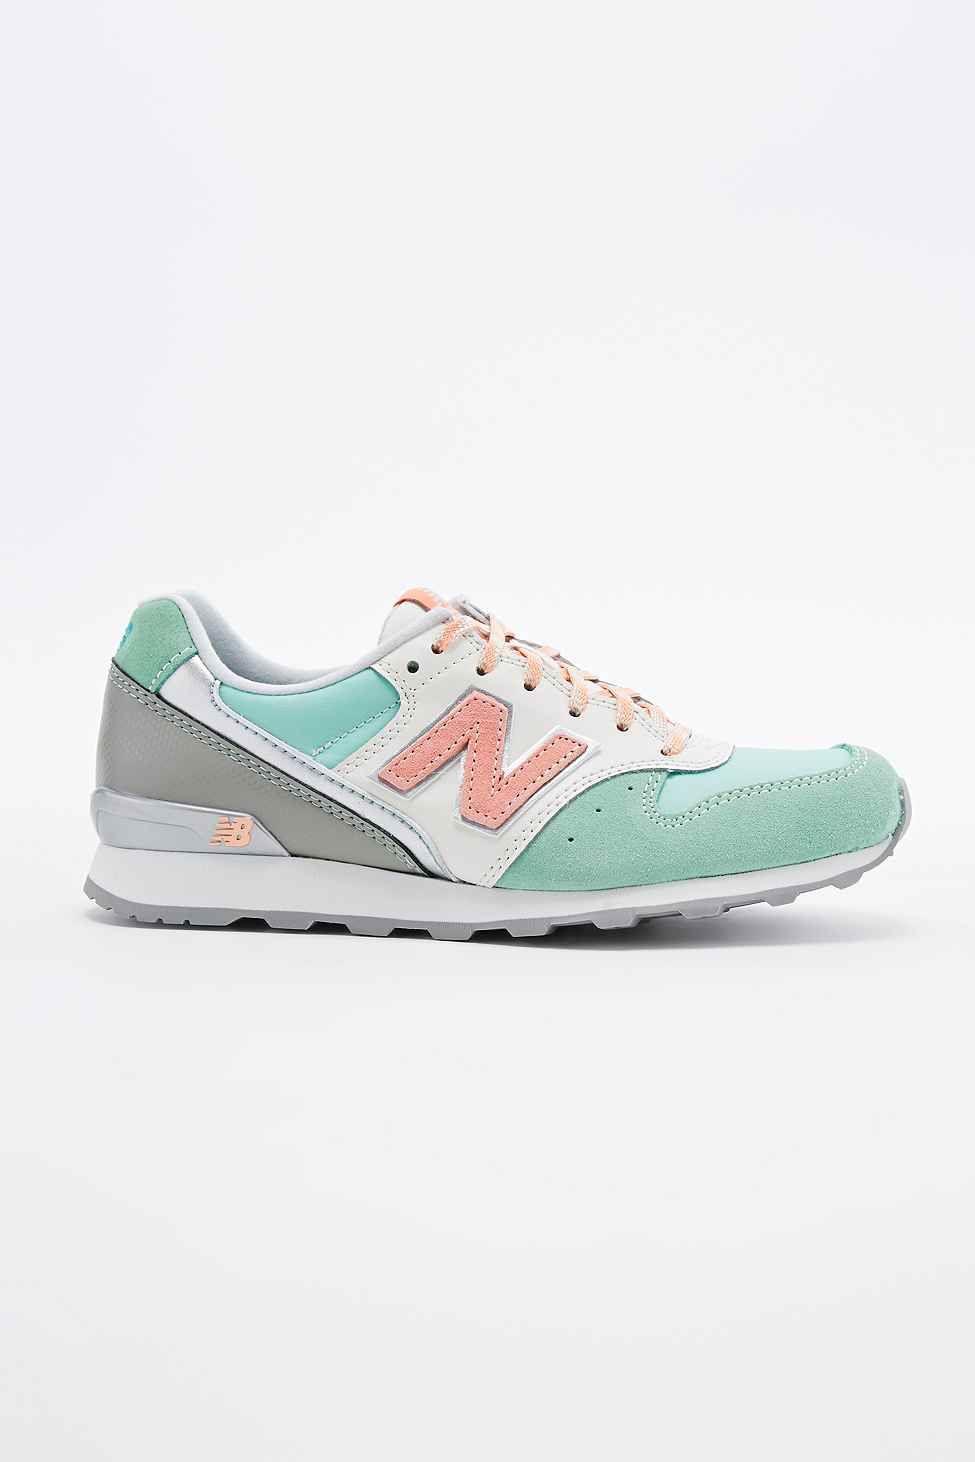 WOMENS ZANTE - CHAUSSURES - Sneakers & Tennis bassesNew Balance 4UKgyE2